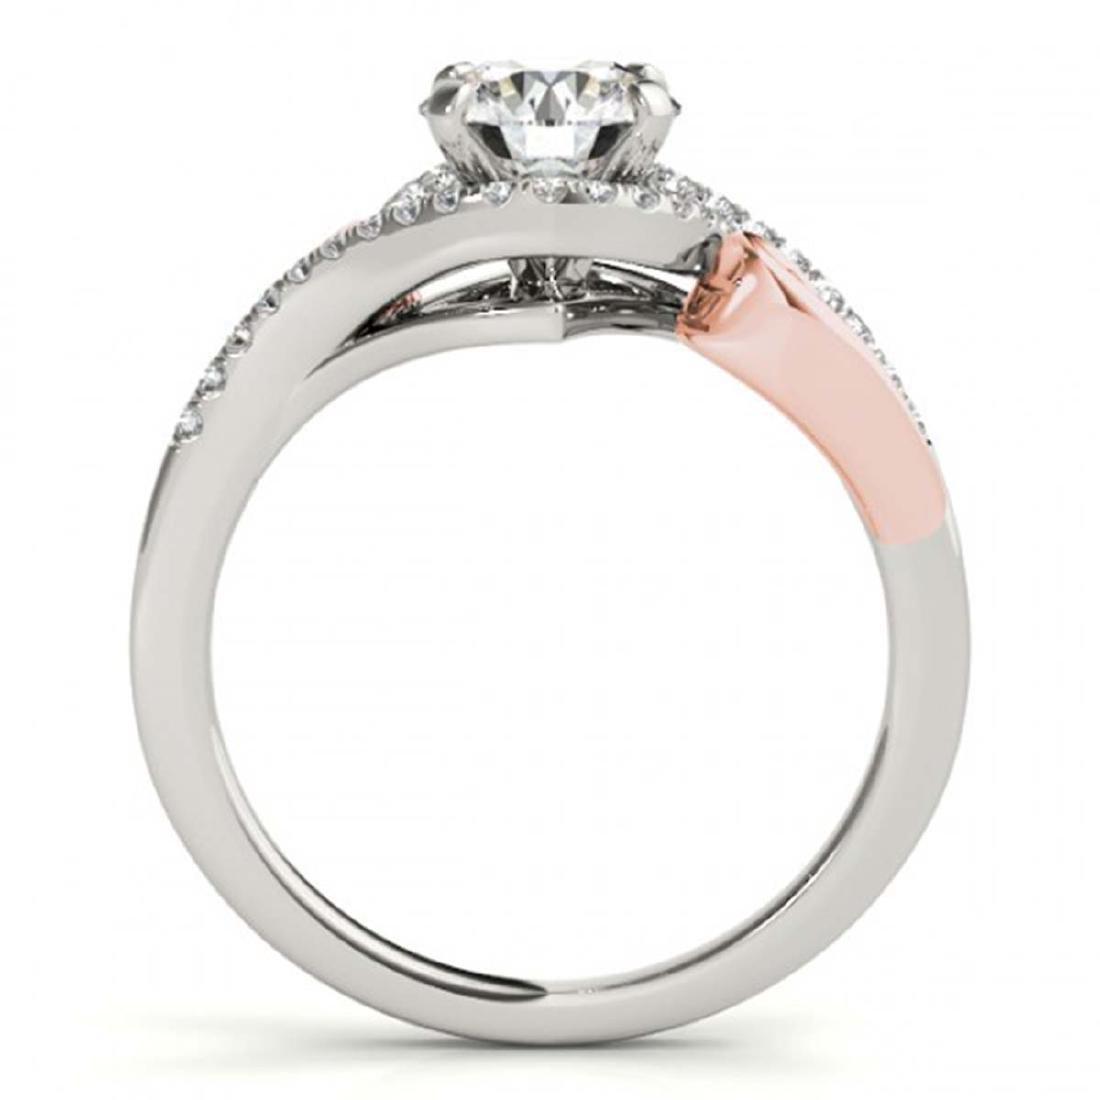 1 ctw VS/SI Diamond Solitaire Halo Ring 18K White & - 2